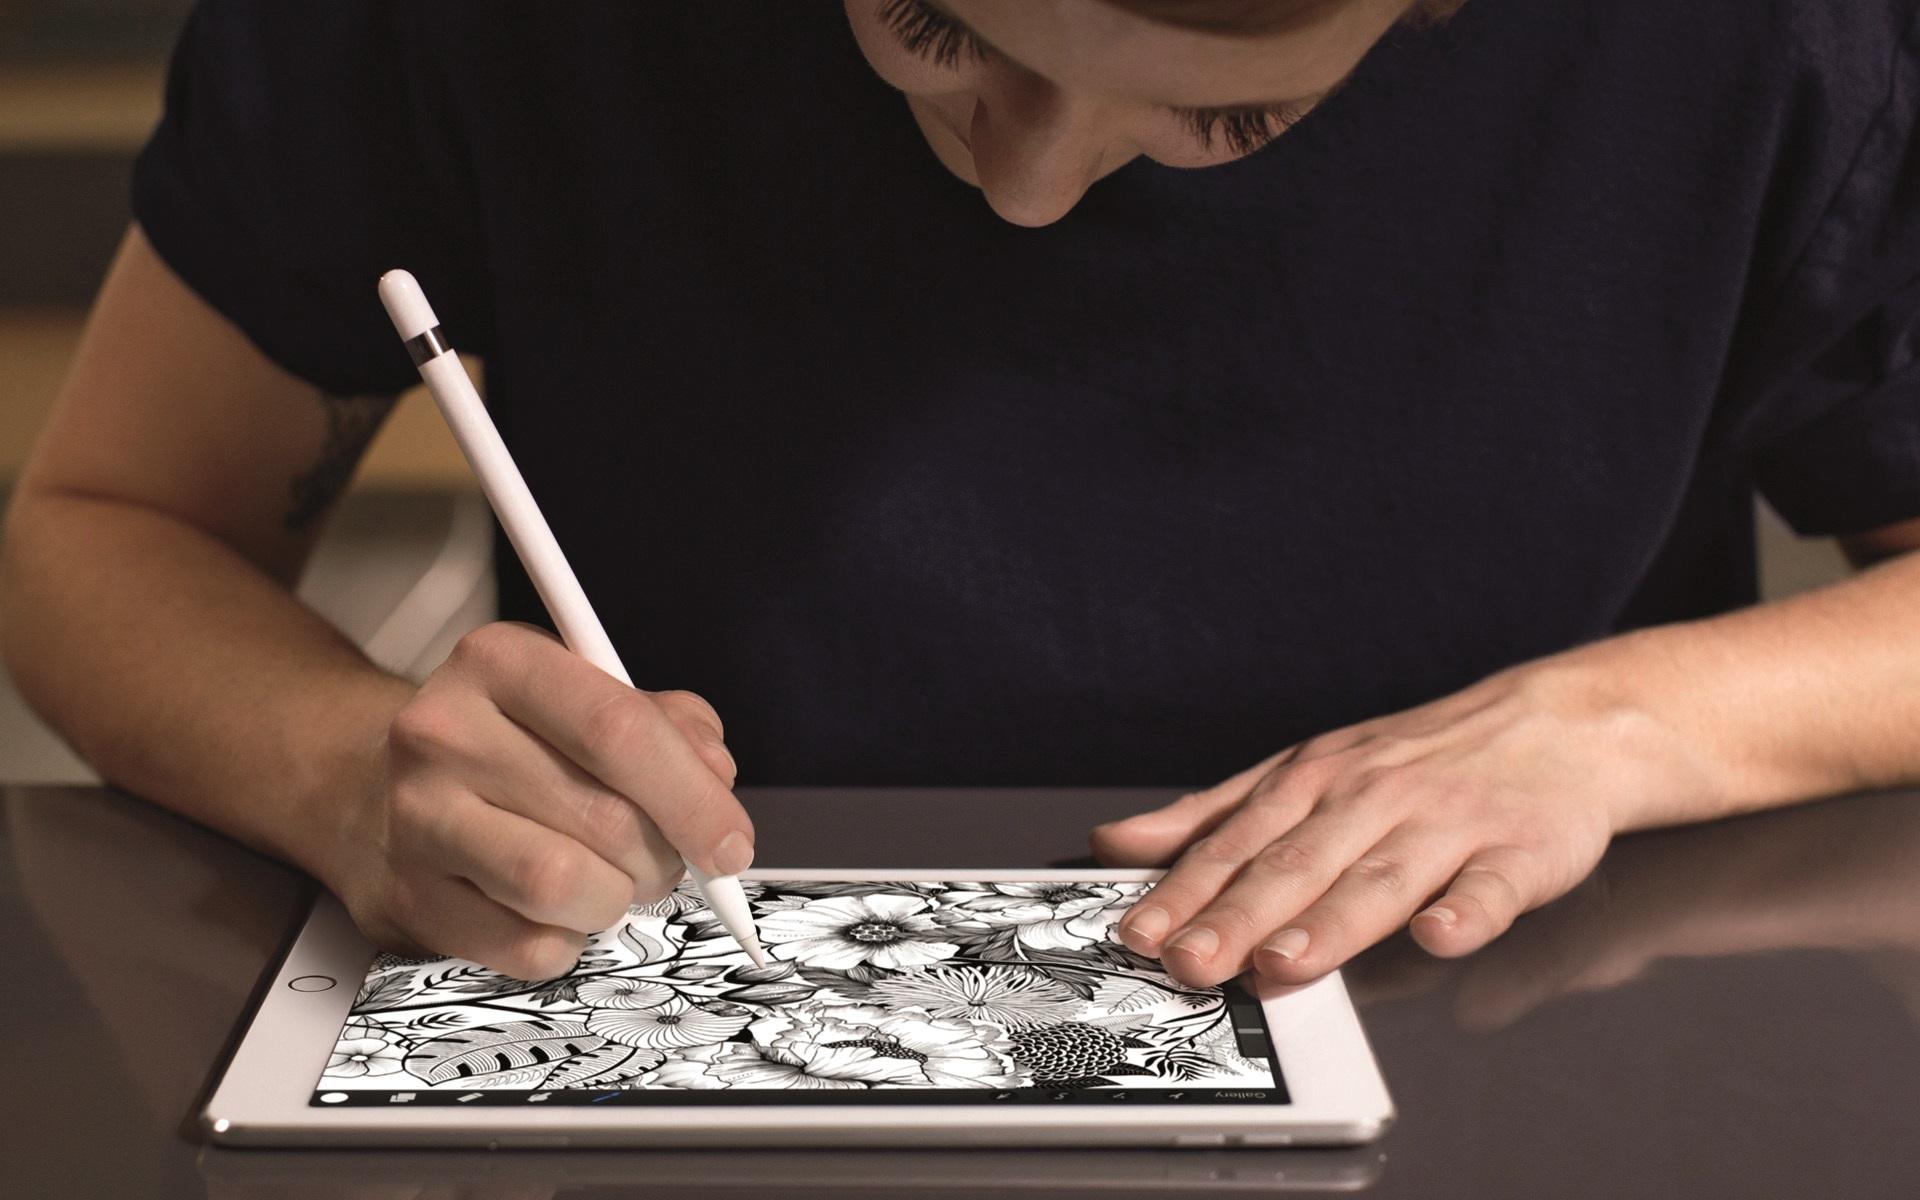 iPad Pro (9.7 inch)